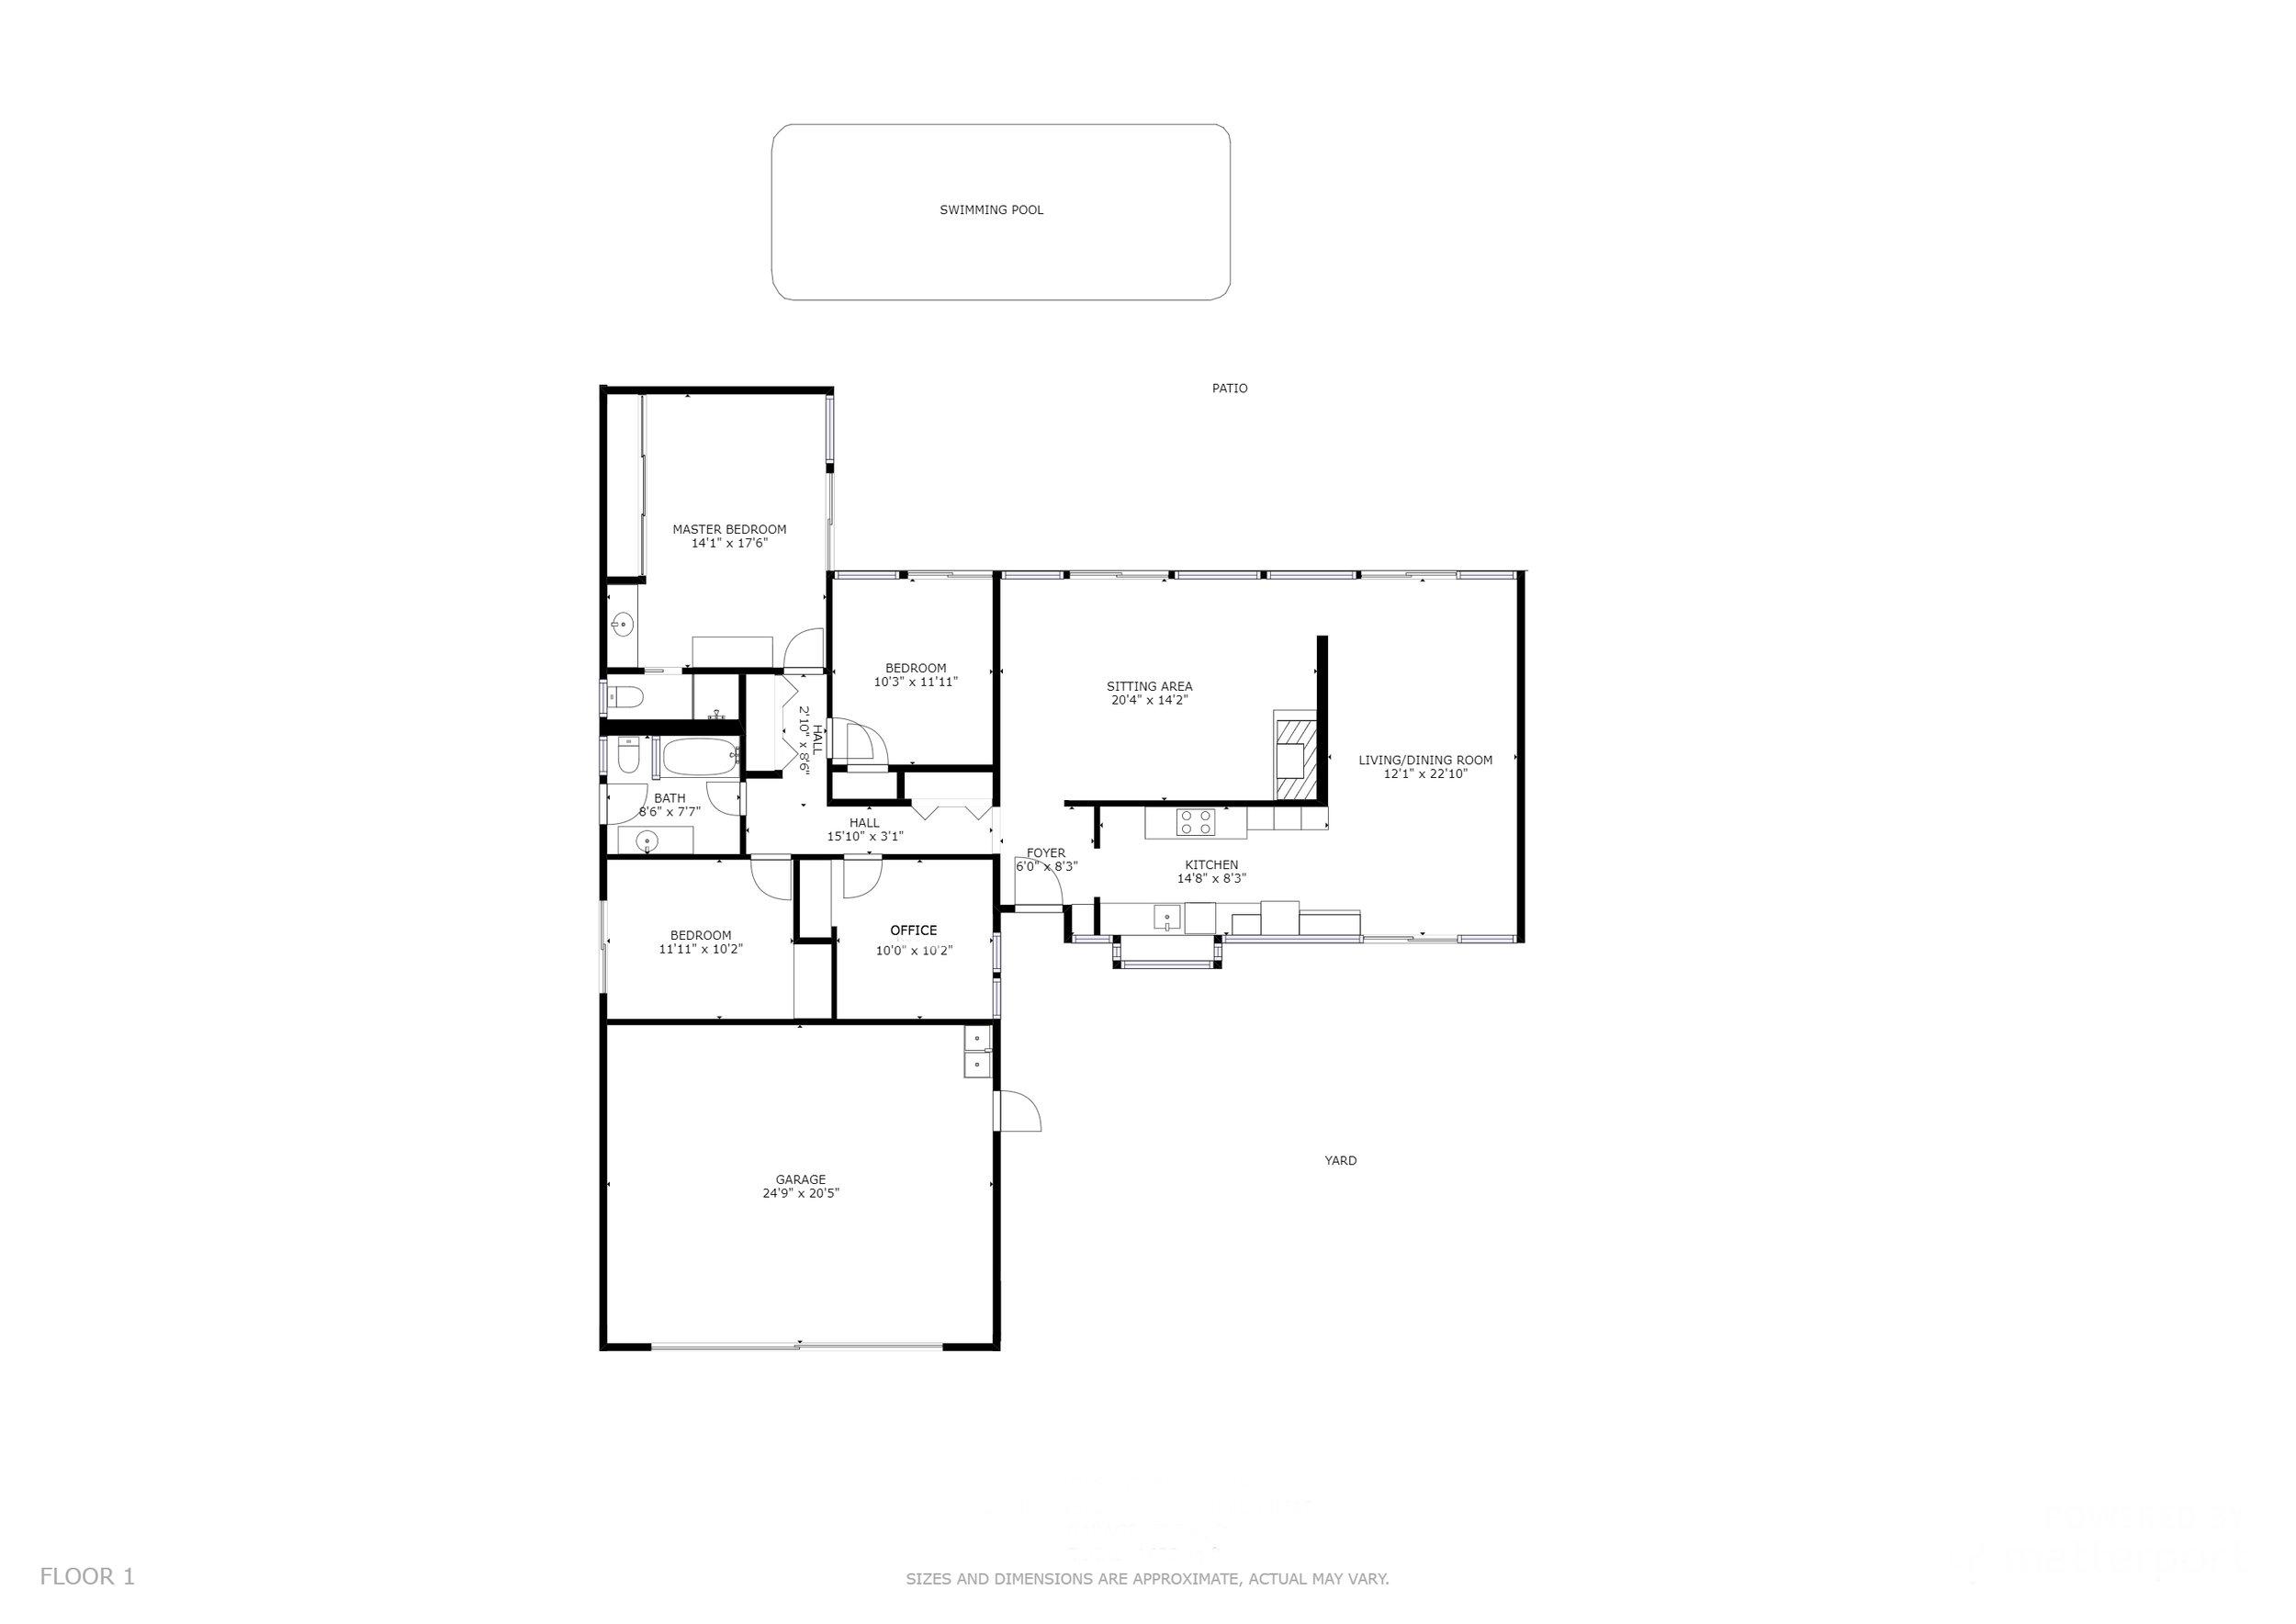 floor plan edit.jpg